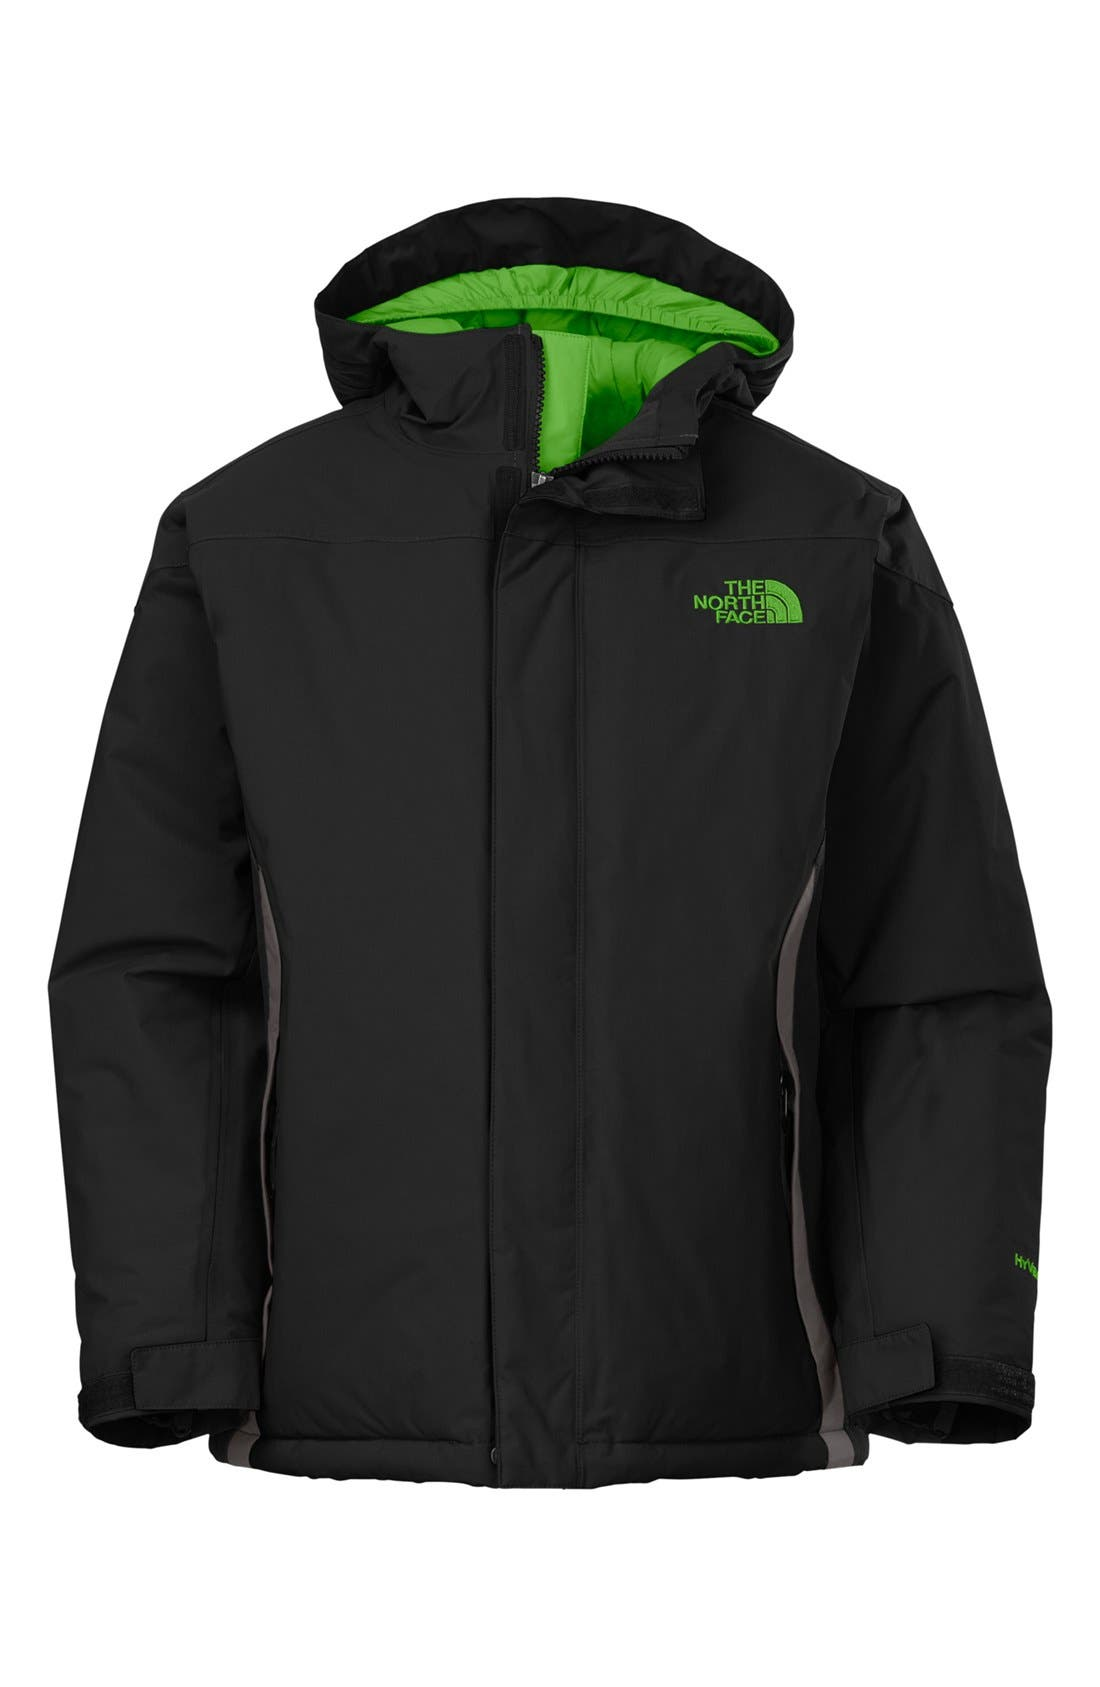 Alternate Image 1 Selected - The North Face 'Navigate' Waterproof Heatseeker™ Aero Snowsport Jacket (Big Boys)